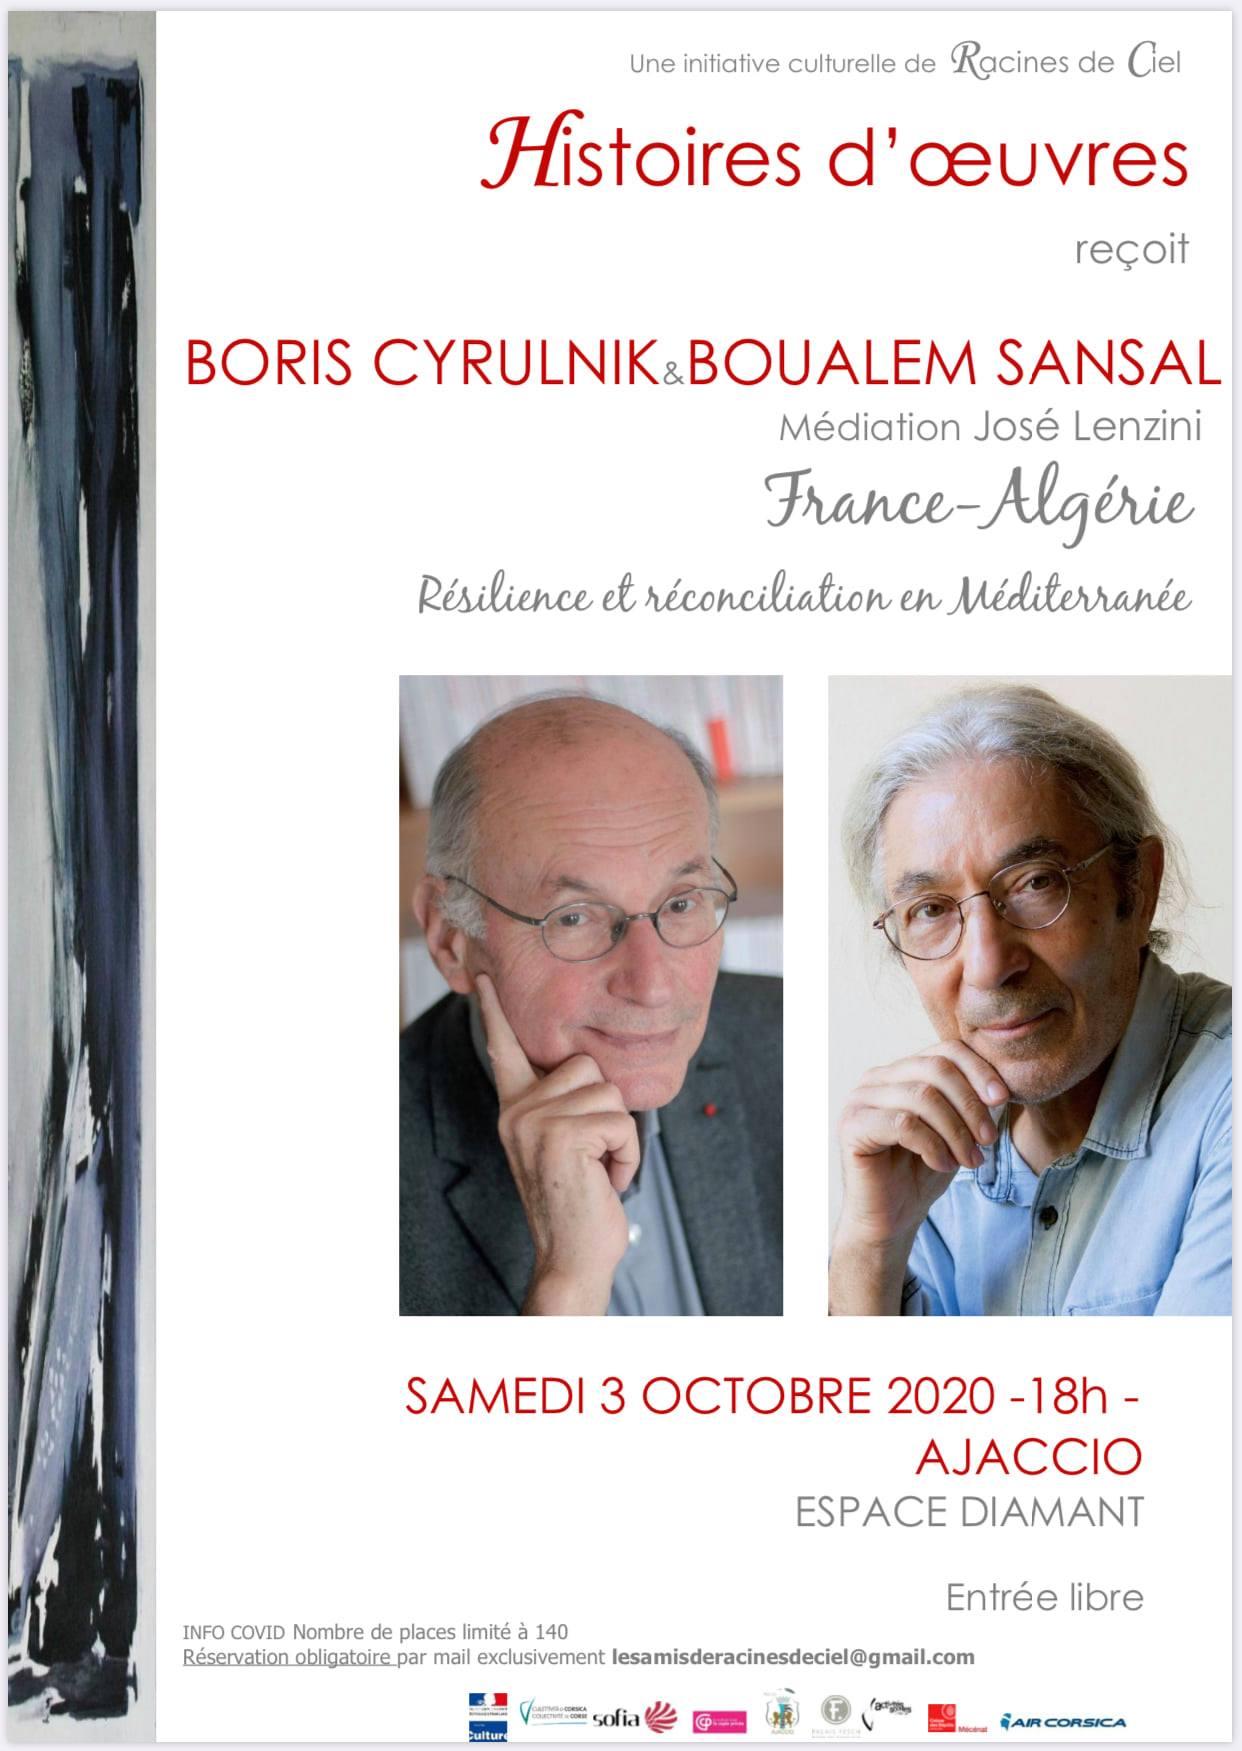 BORIS CYRULNIK & BOUALEM SANSAL à l'Espace Diamant